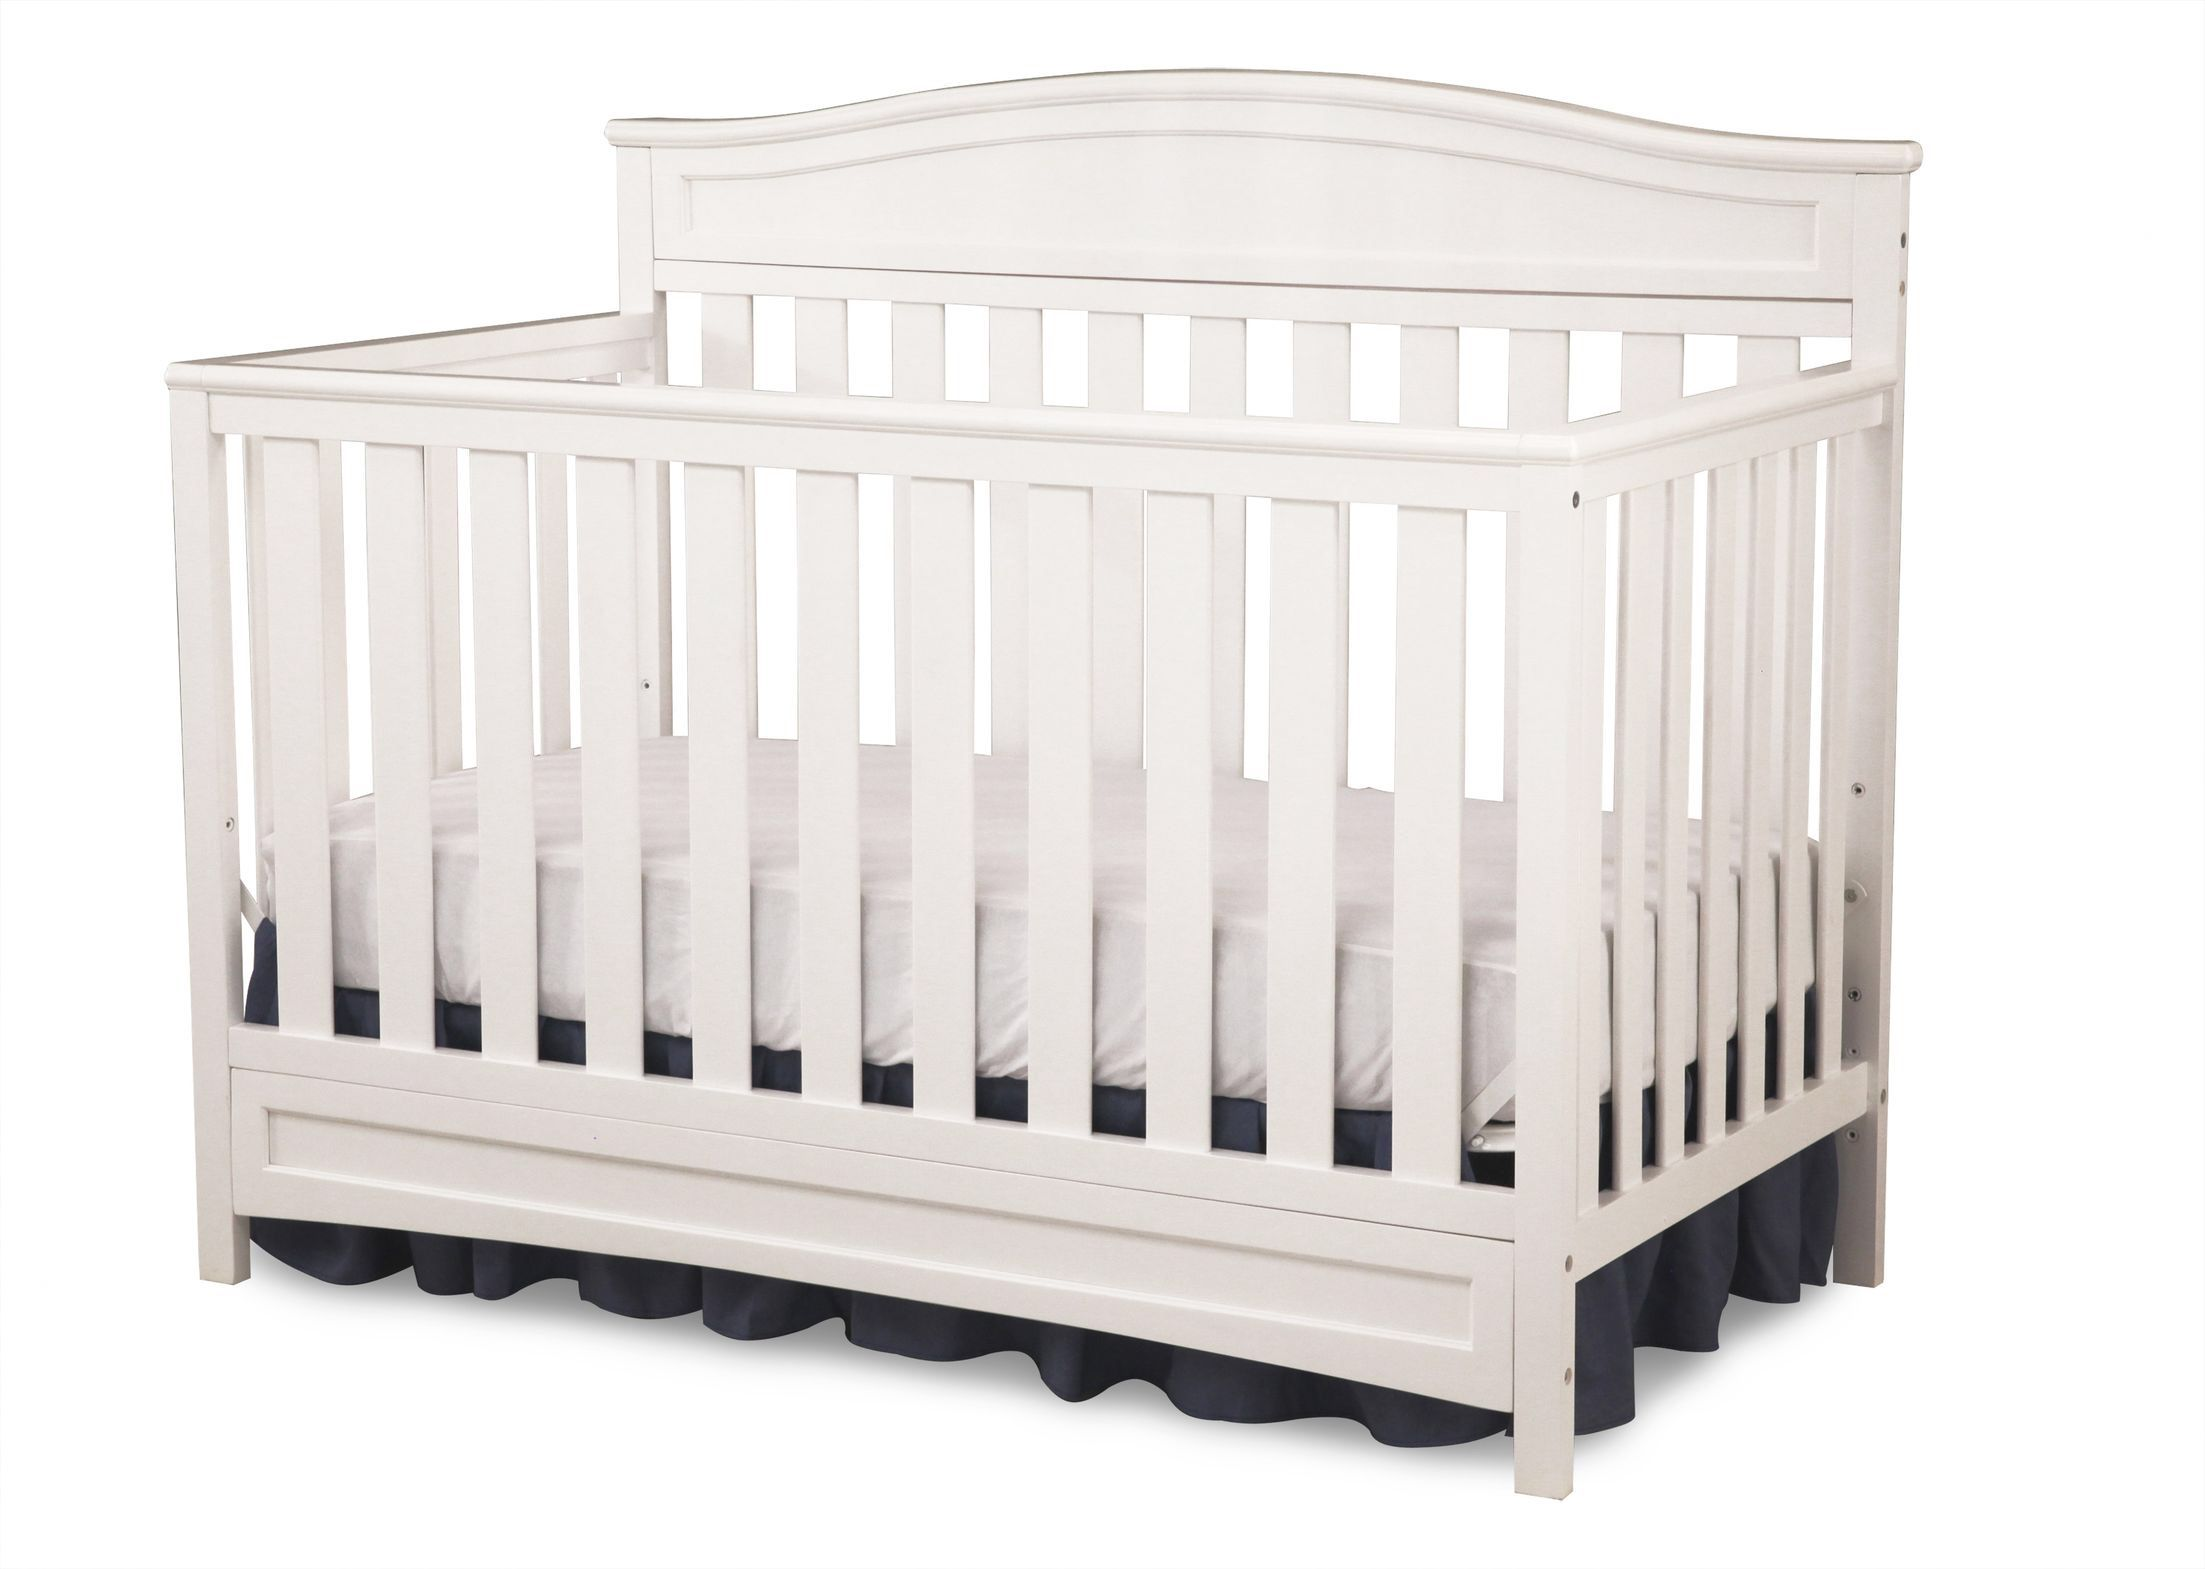 Emery 4 In 1 Convertible Crib Baby Cribs Convertible Convertible Crib White Best Baby Cribs